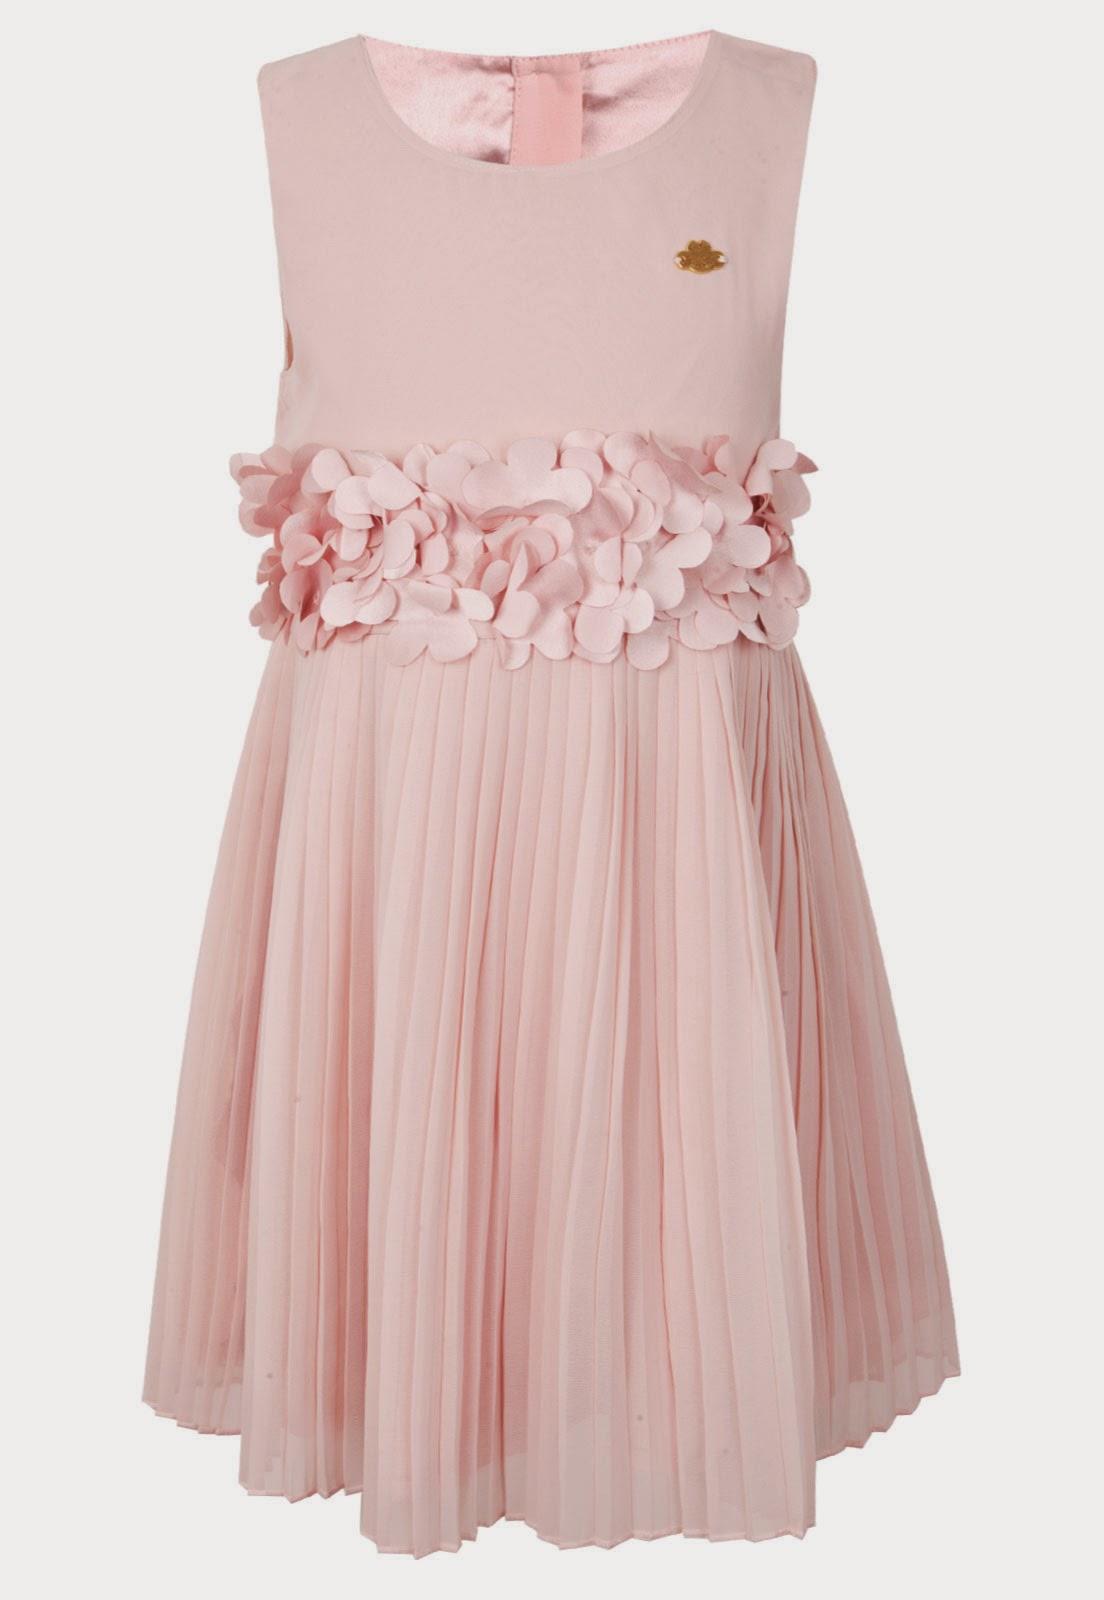 Vestido Lilica Ripilica Infantil Flower rosa